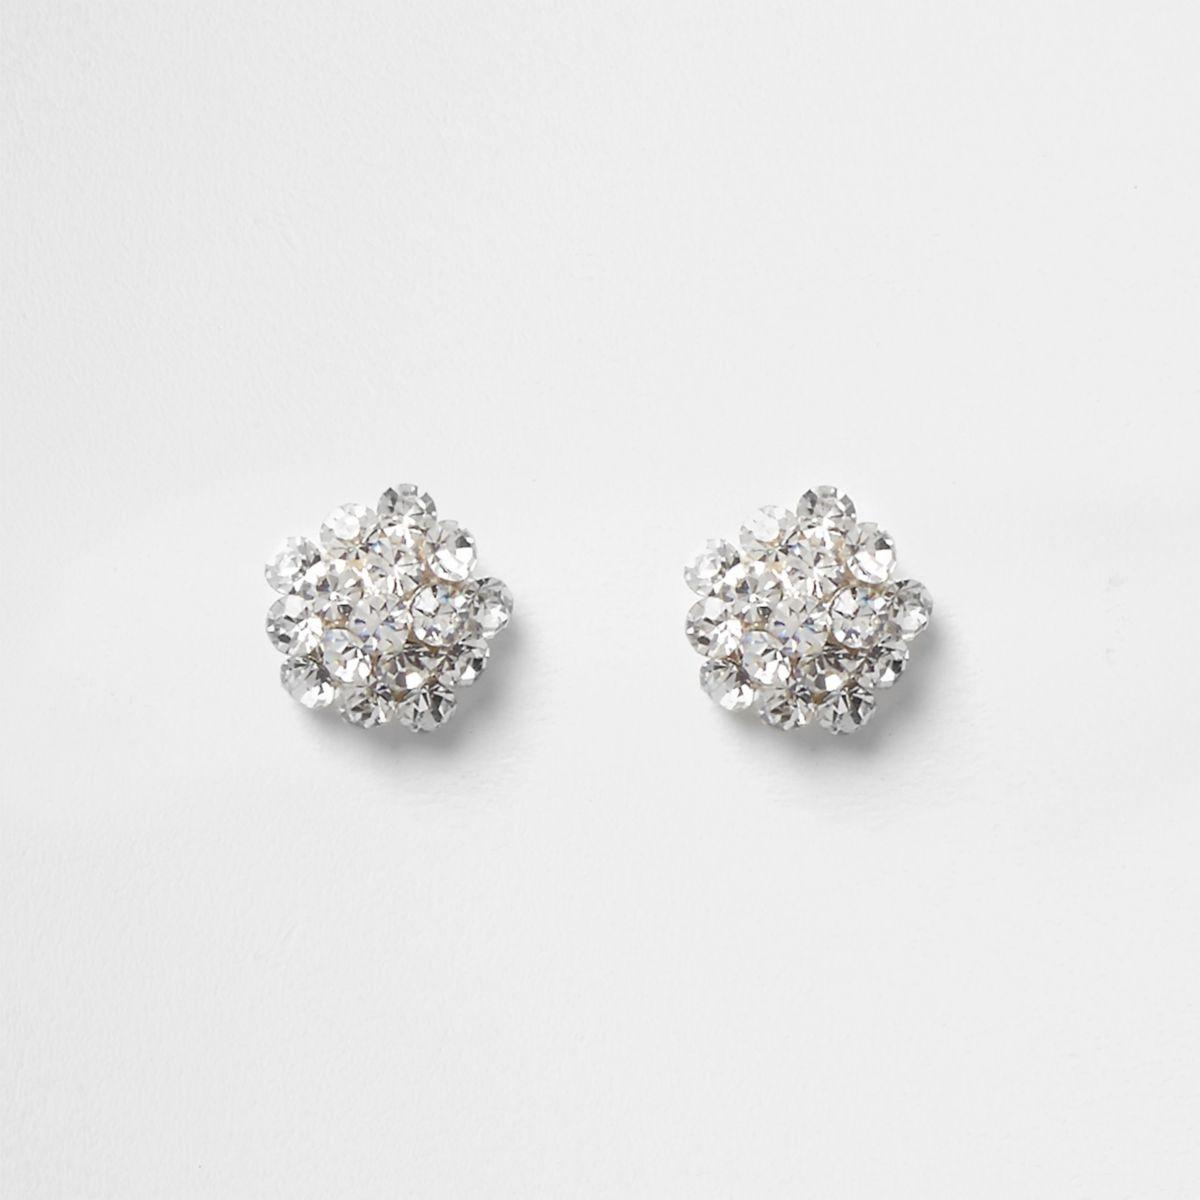 Silver tone rhinestone cluster stud earrings